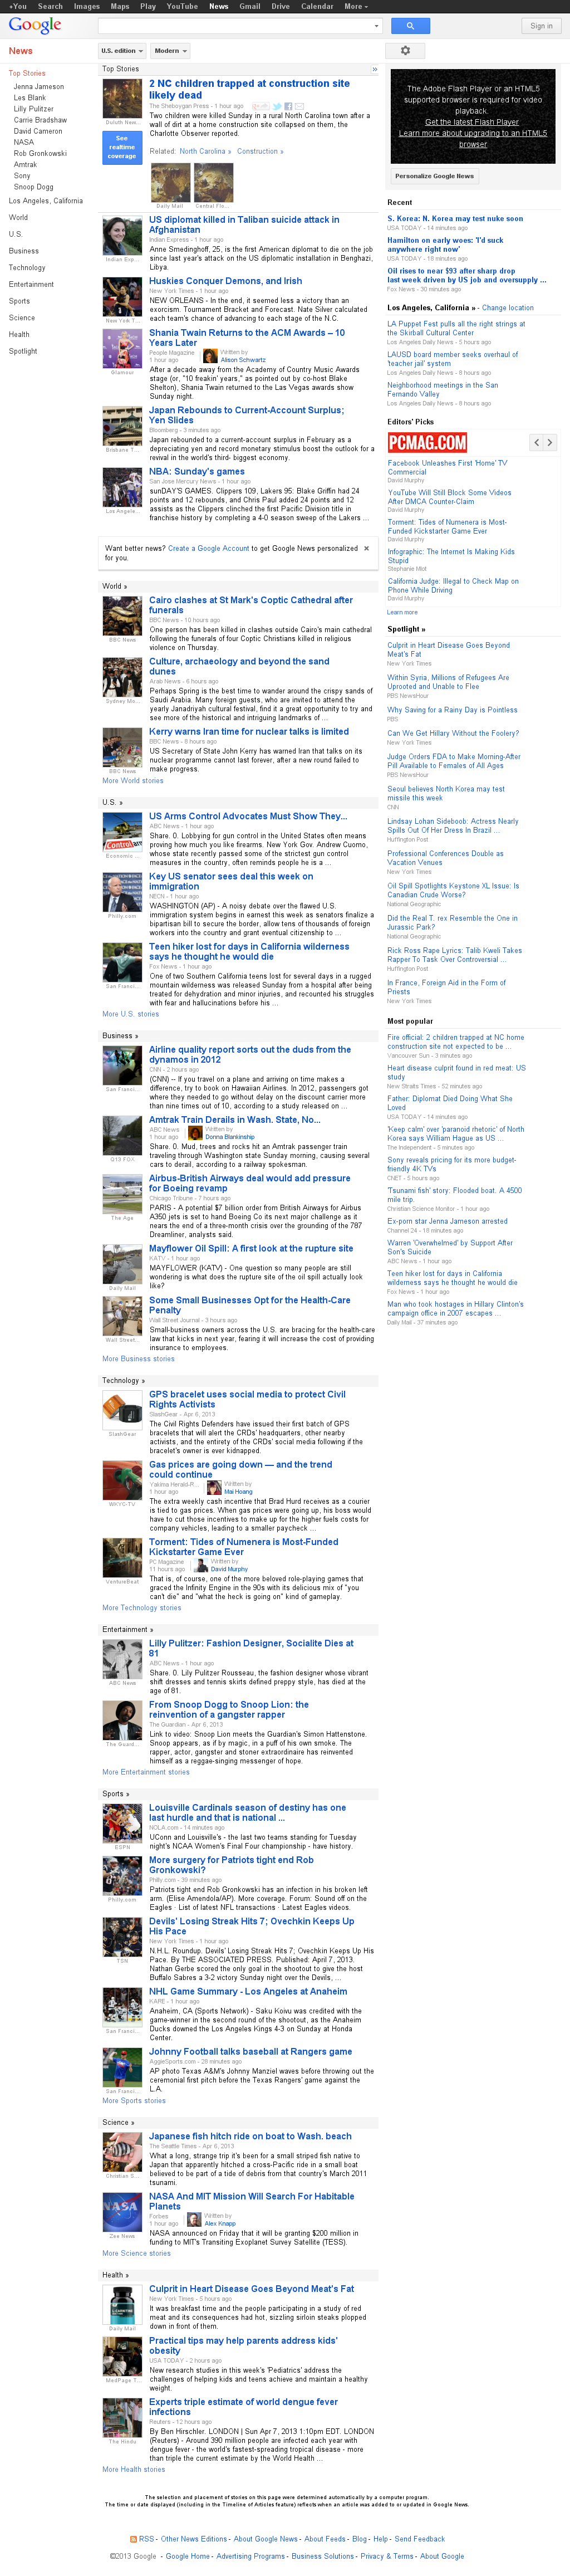 Google News at Monday April 8, 2013, 6:08 a.m. UTC